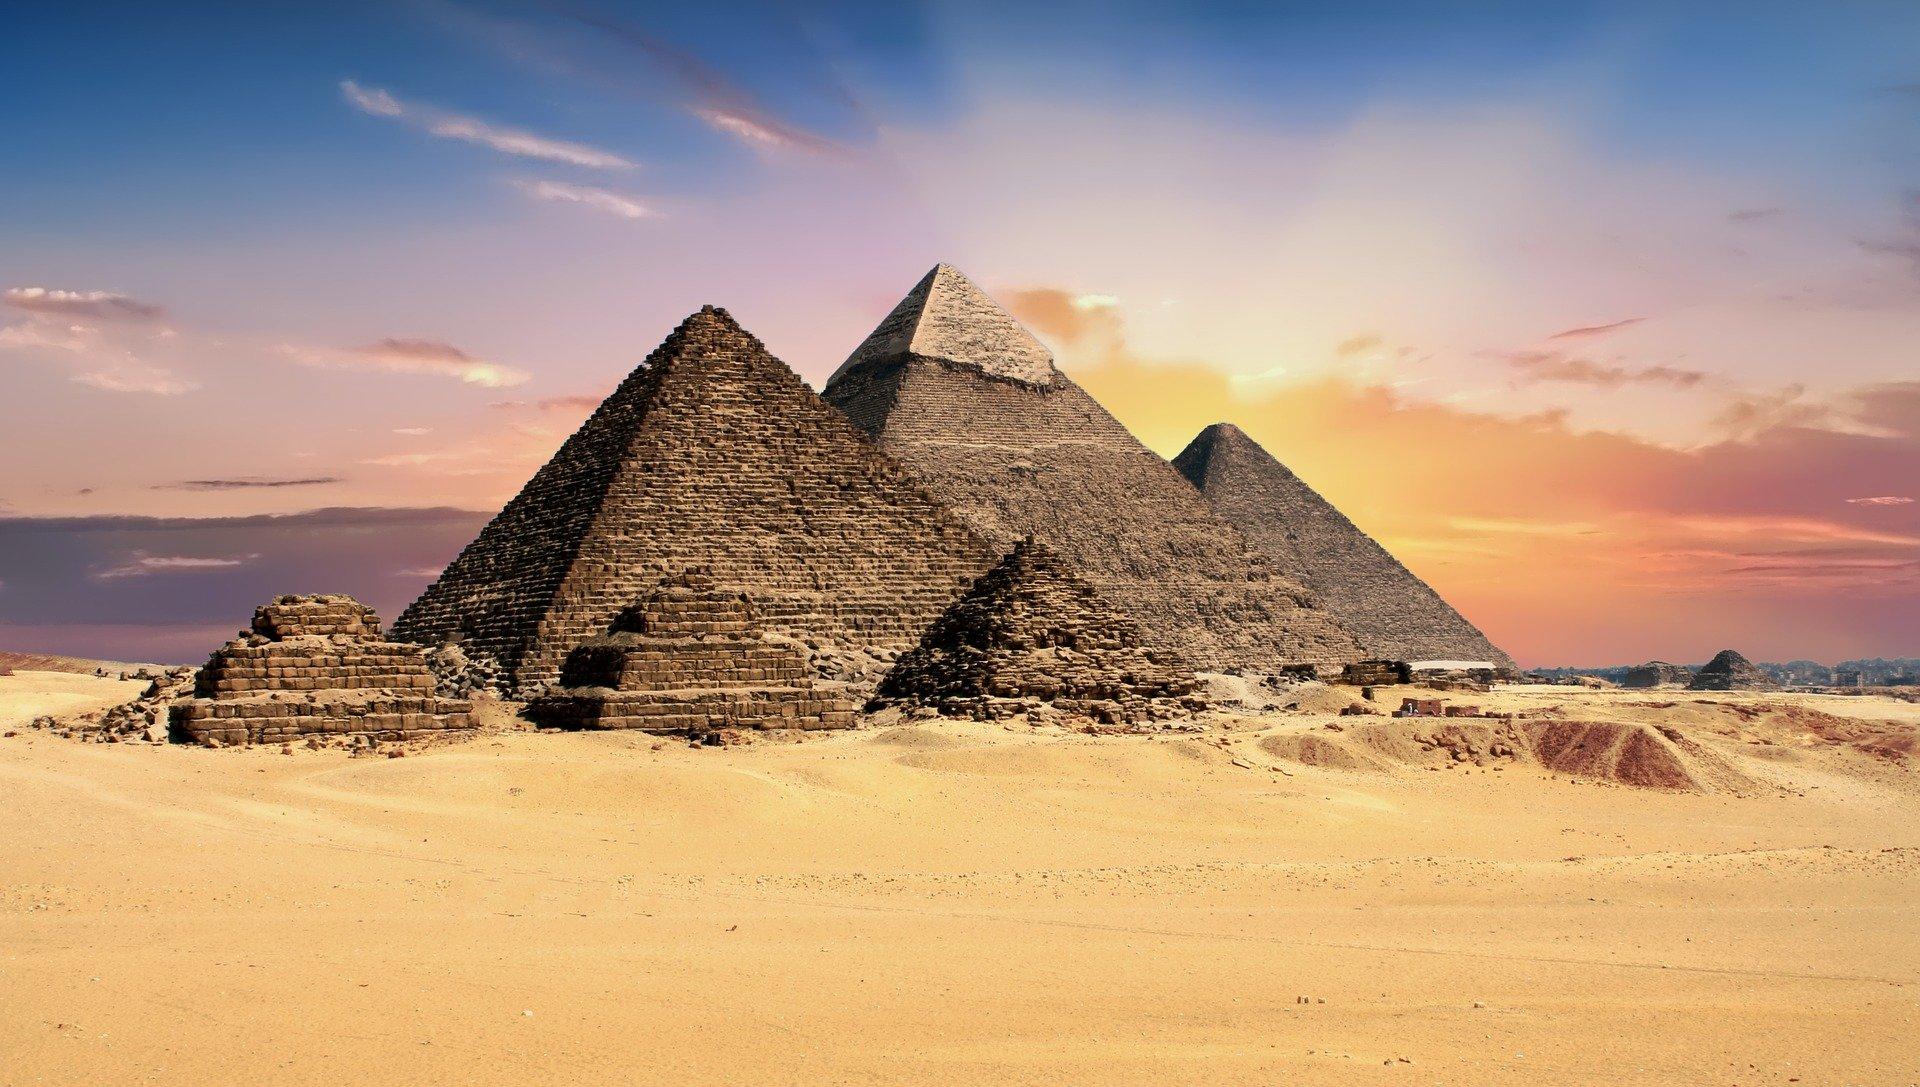 Destination image of Egypt